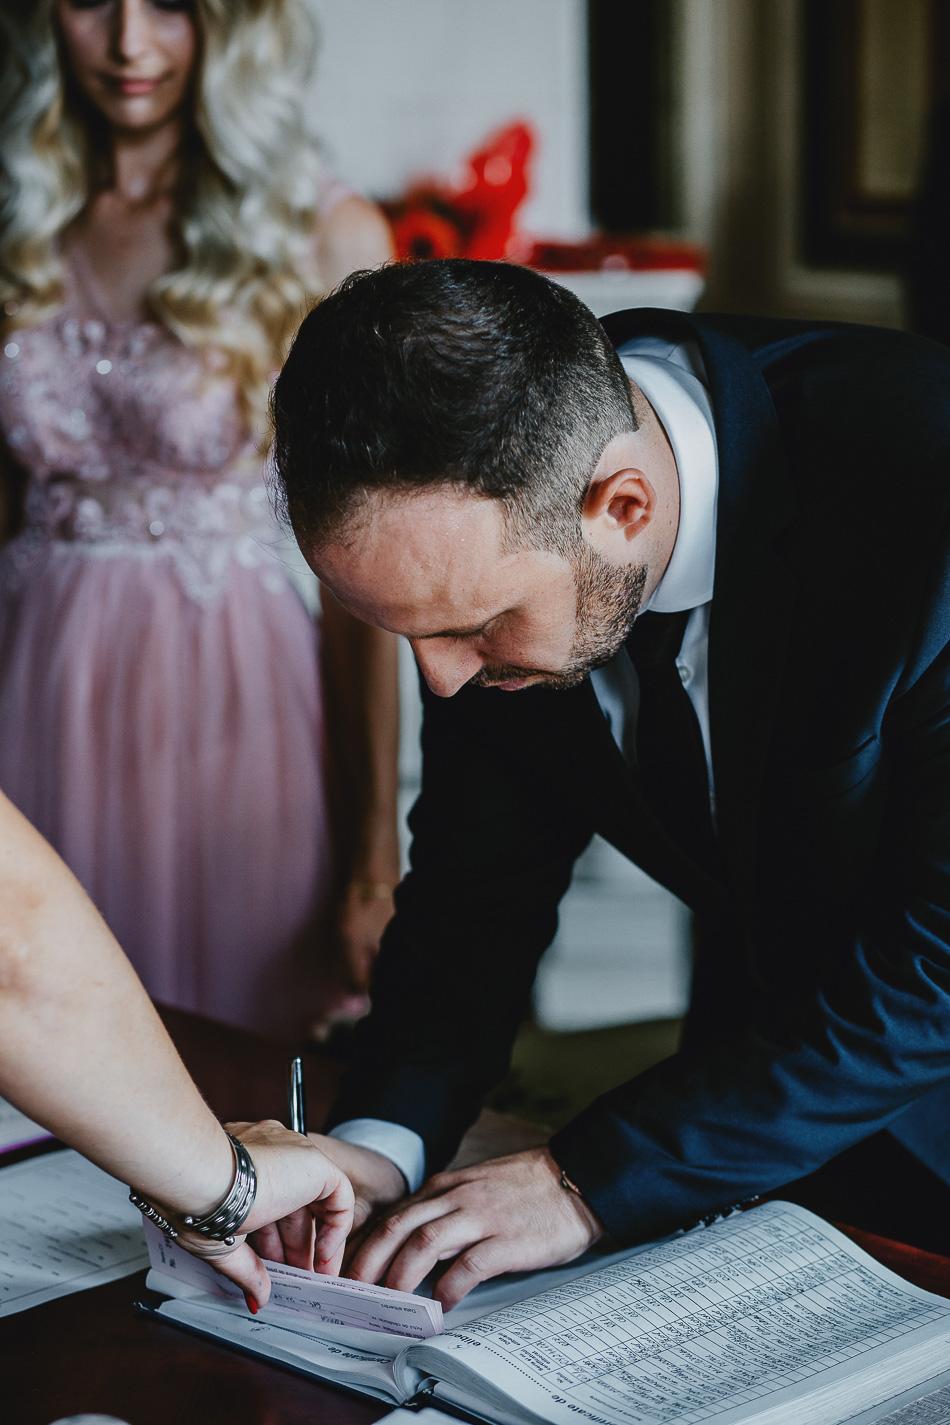 fotograf profesionist targu mures cluj brasov bucuresti cununie civila fotografii creative artistice nunta mire mireasa cetatea medievala